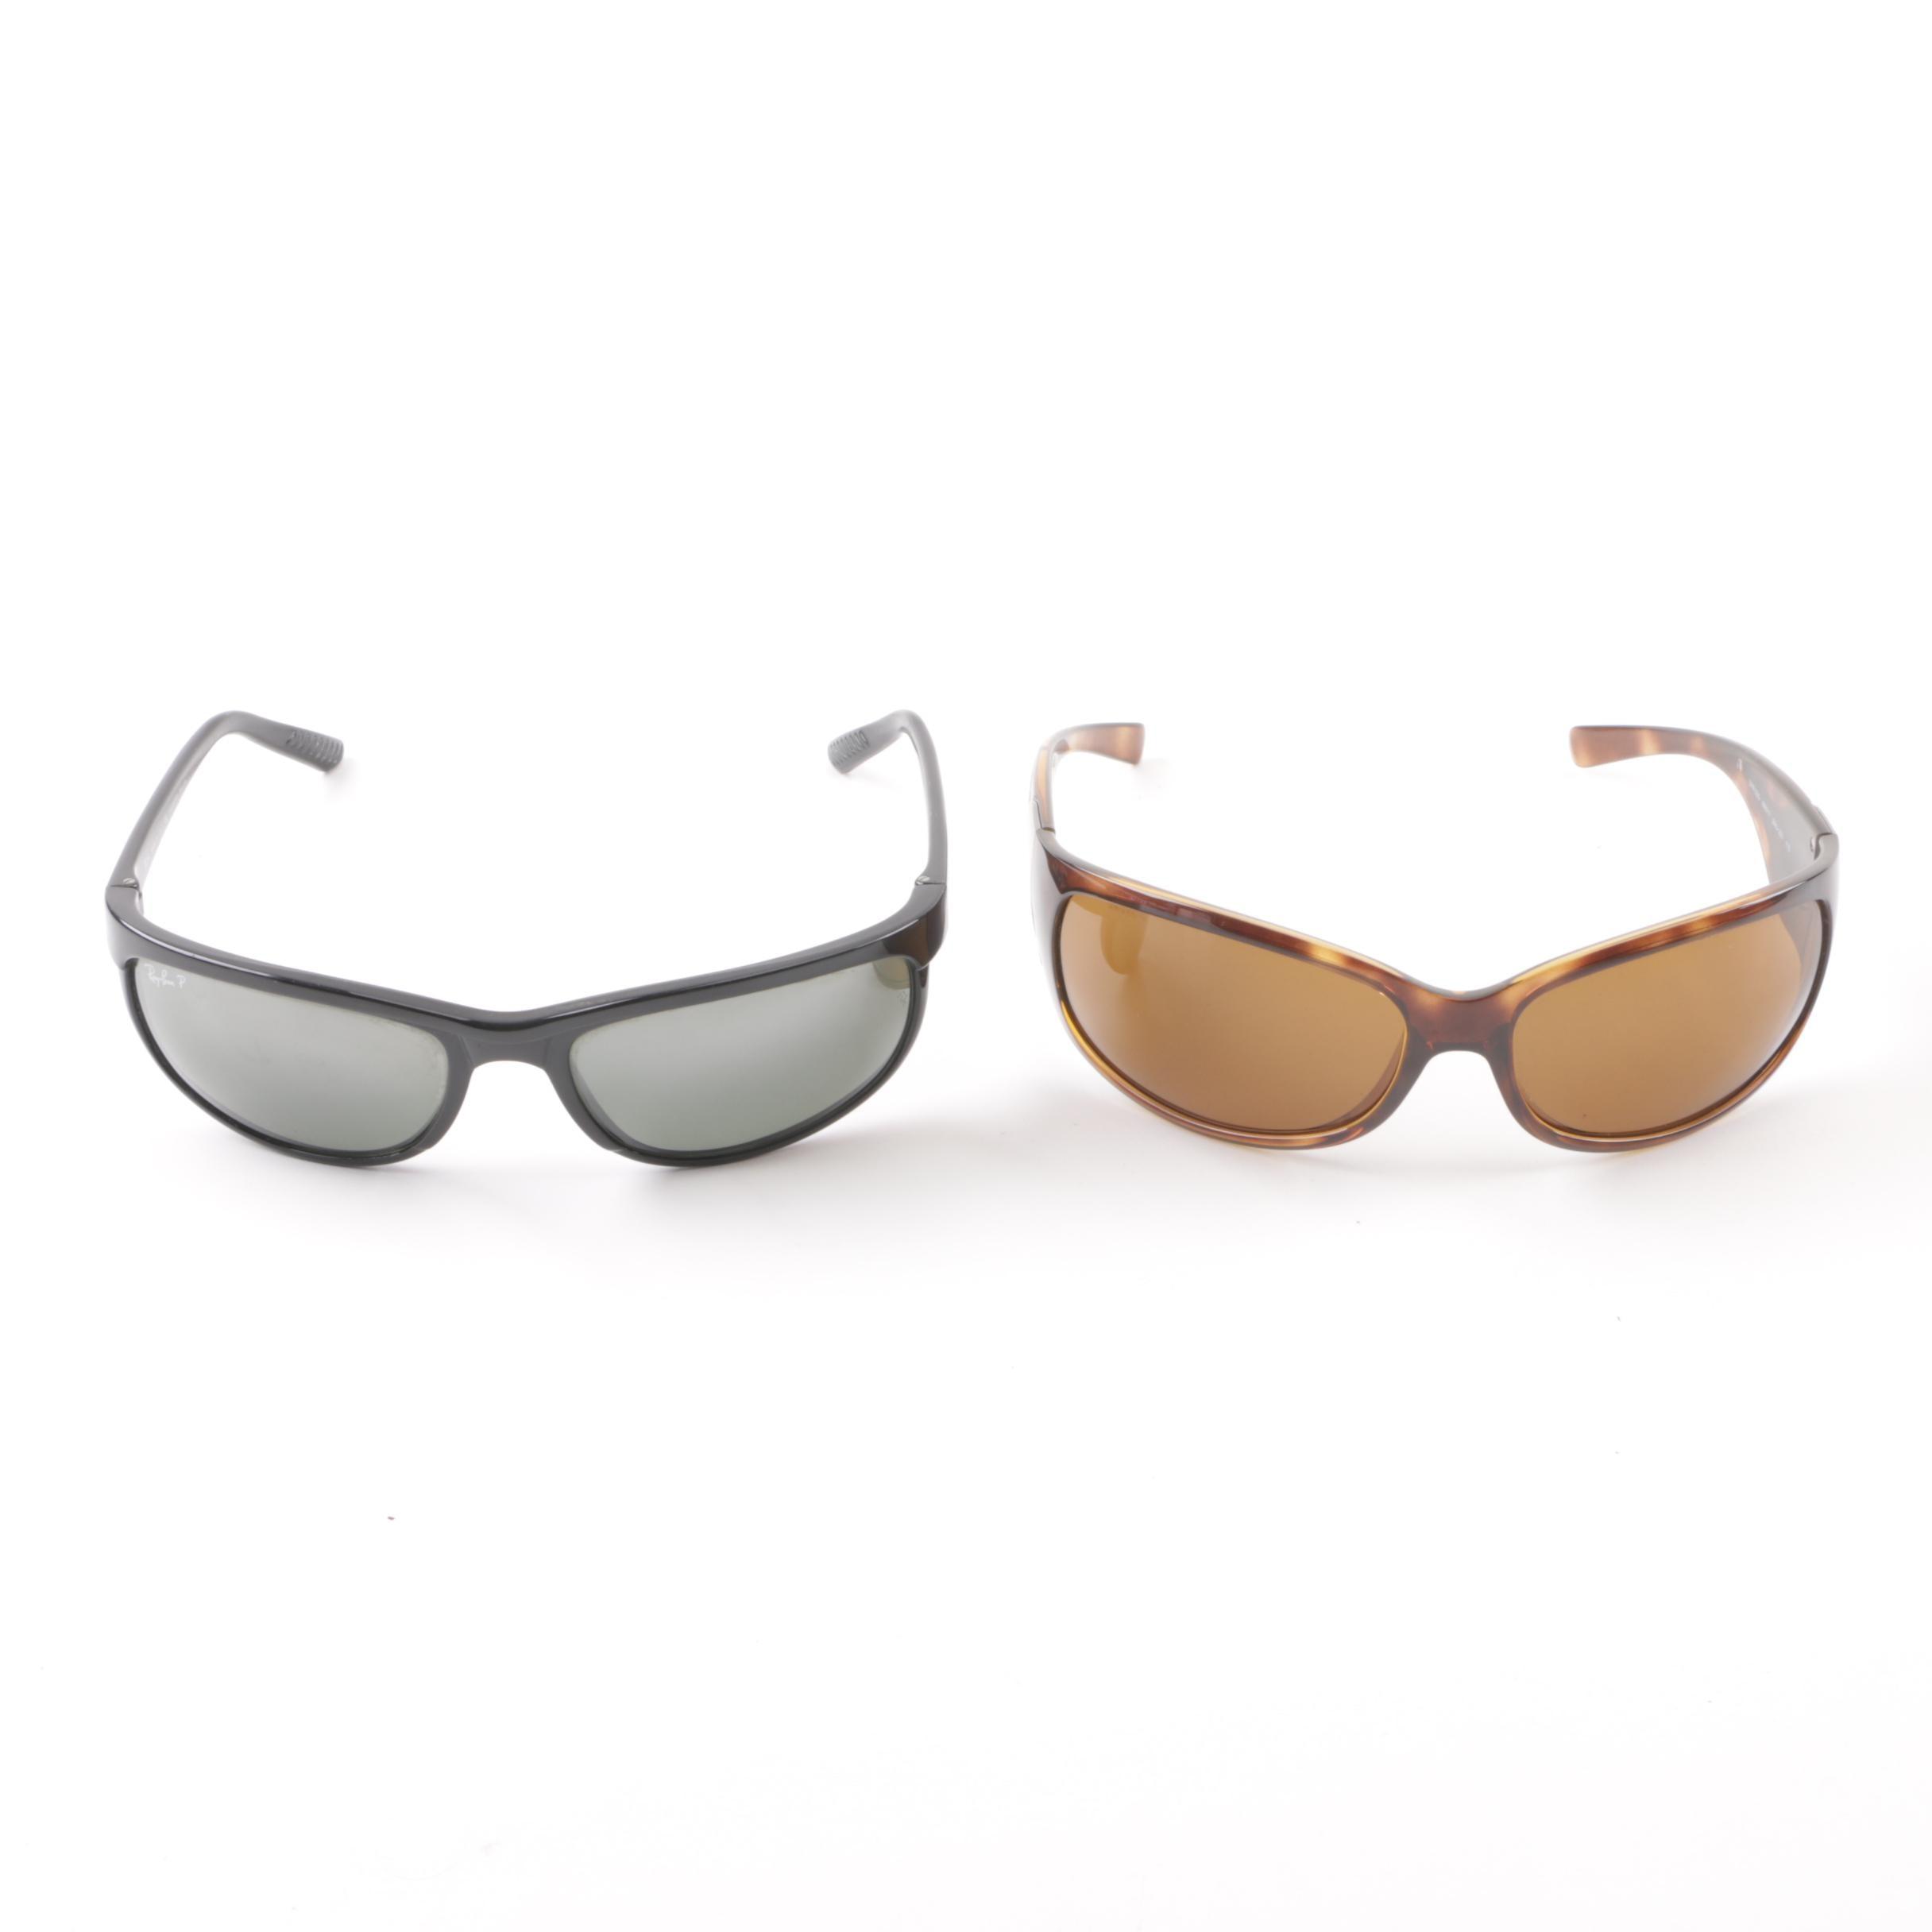 Prada and Prescription Ray-Ban Wrap Sunglasses